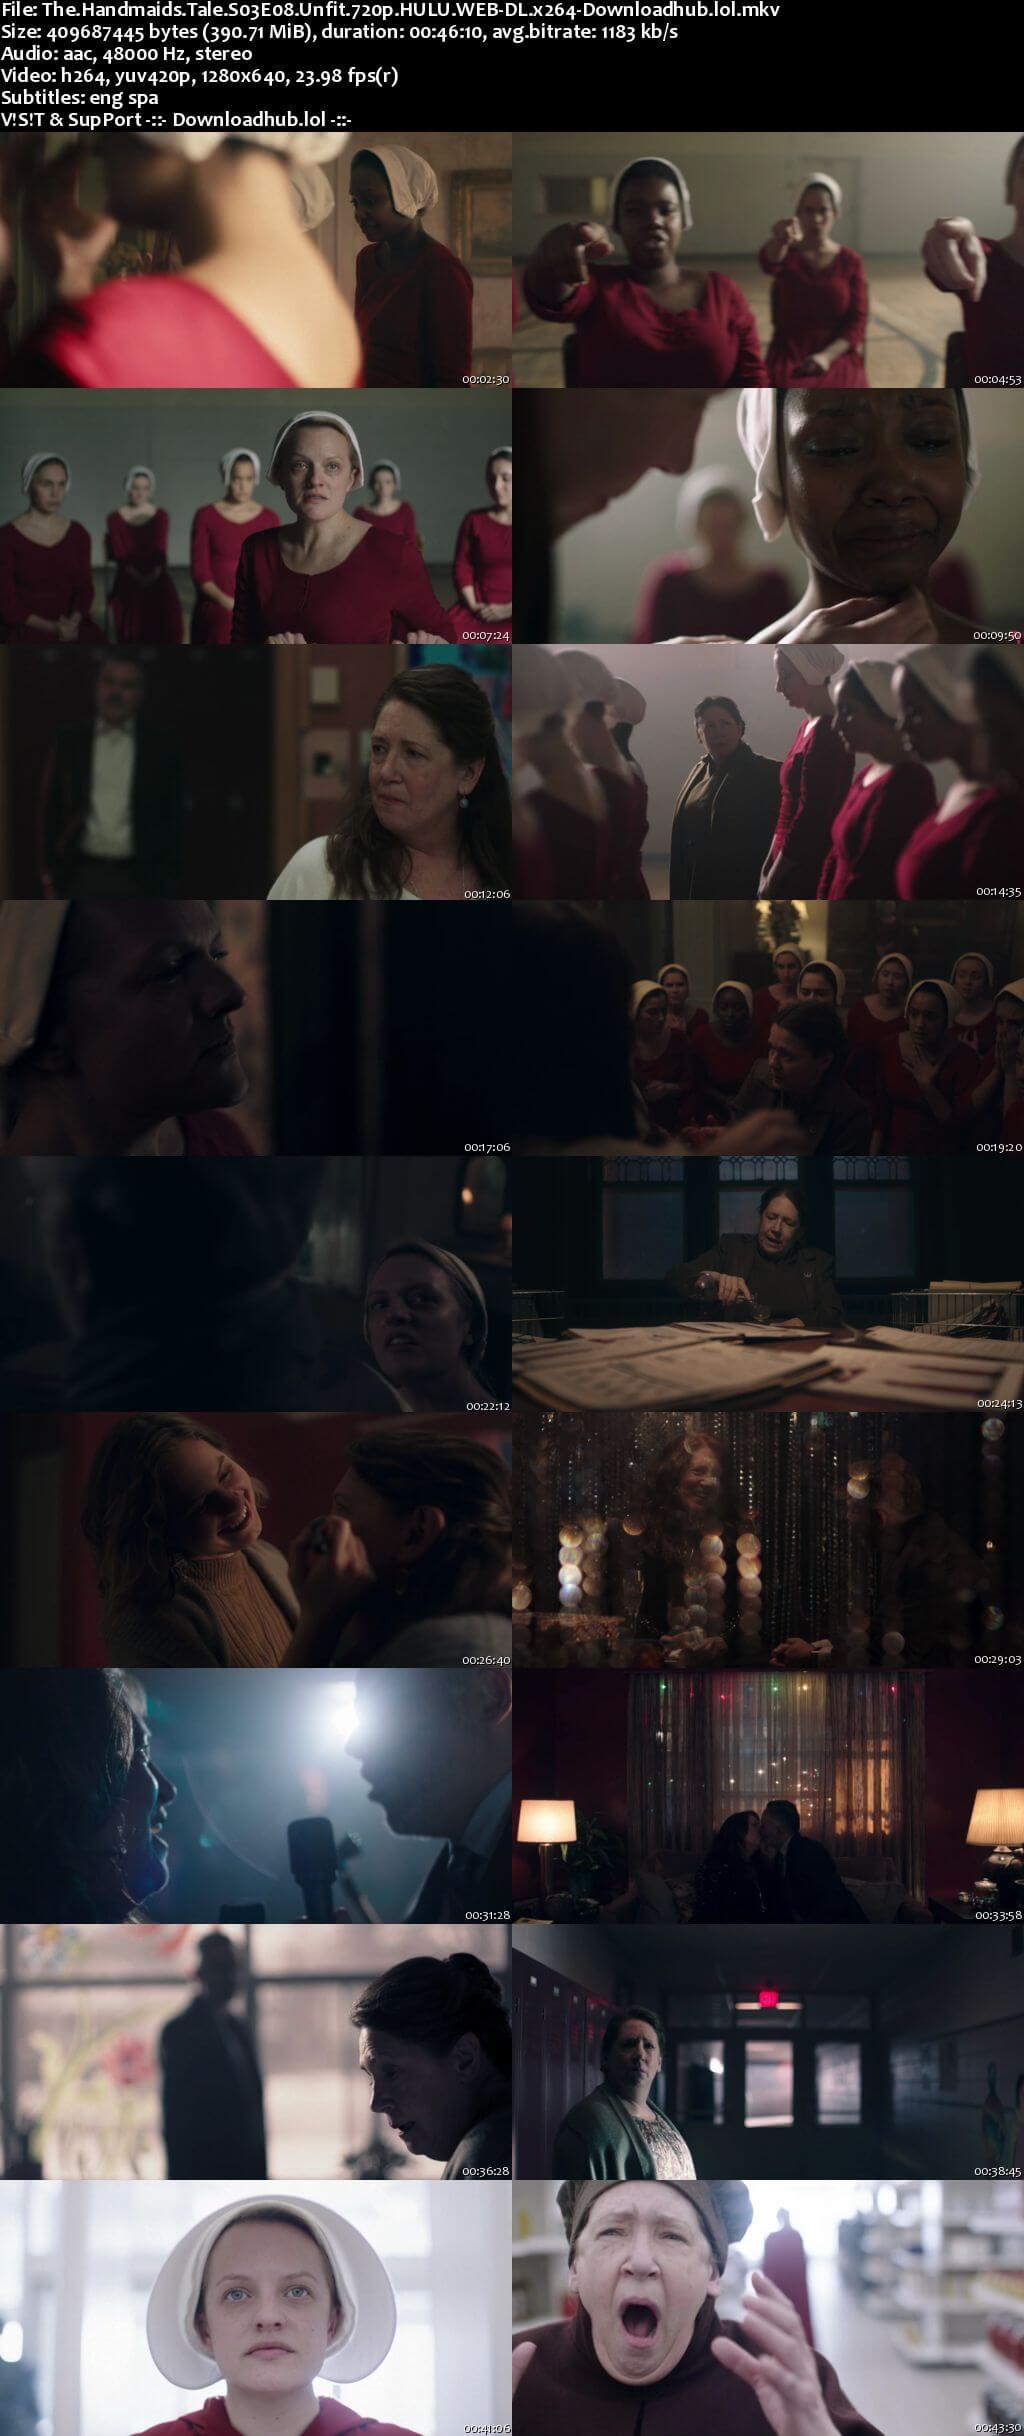 The Handmaids Tale Season 3 Episode 8 720p ESubs Download